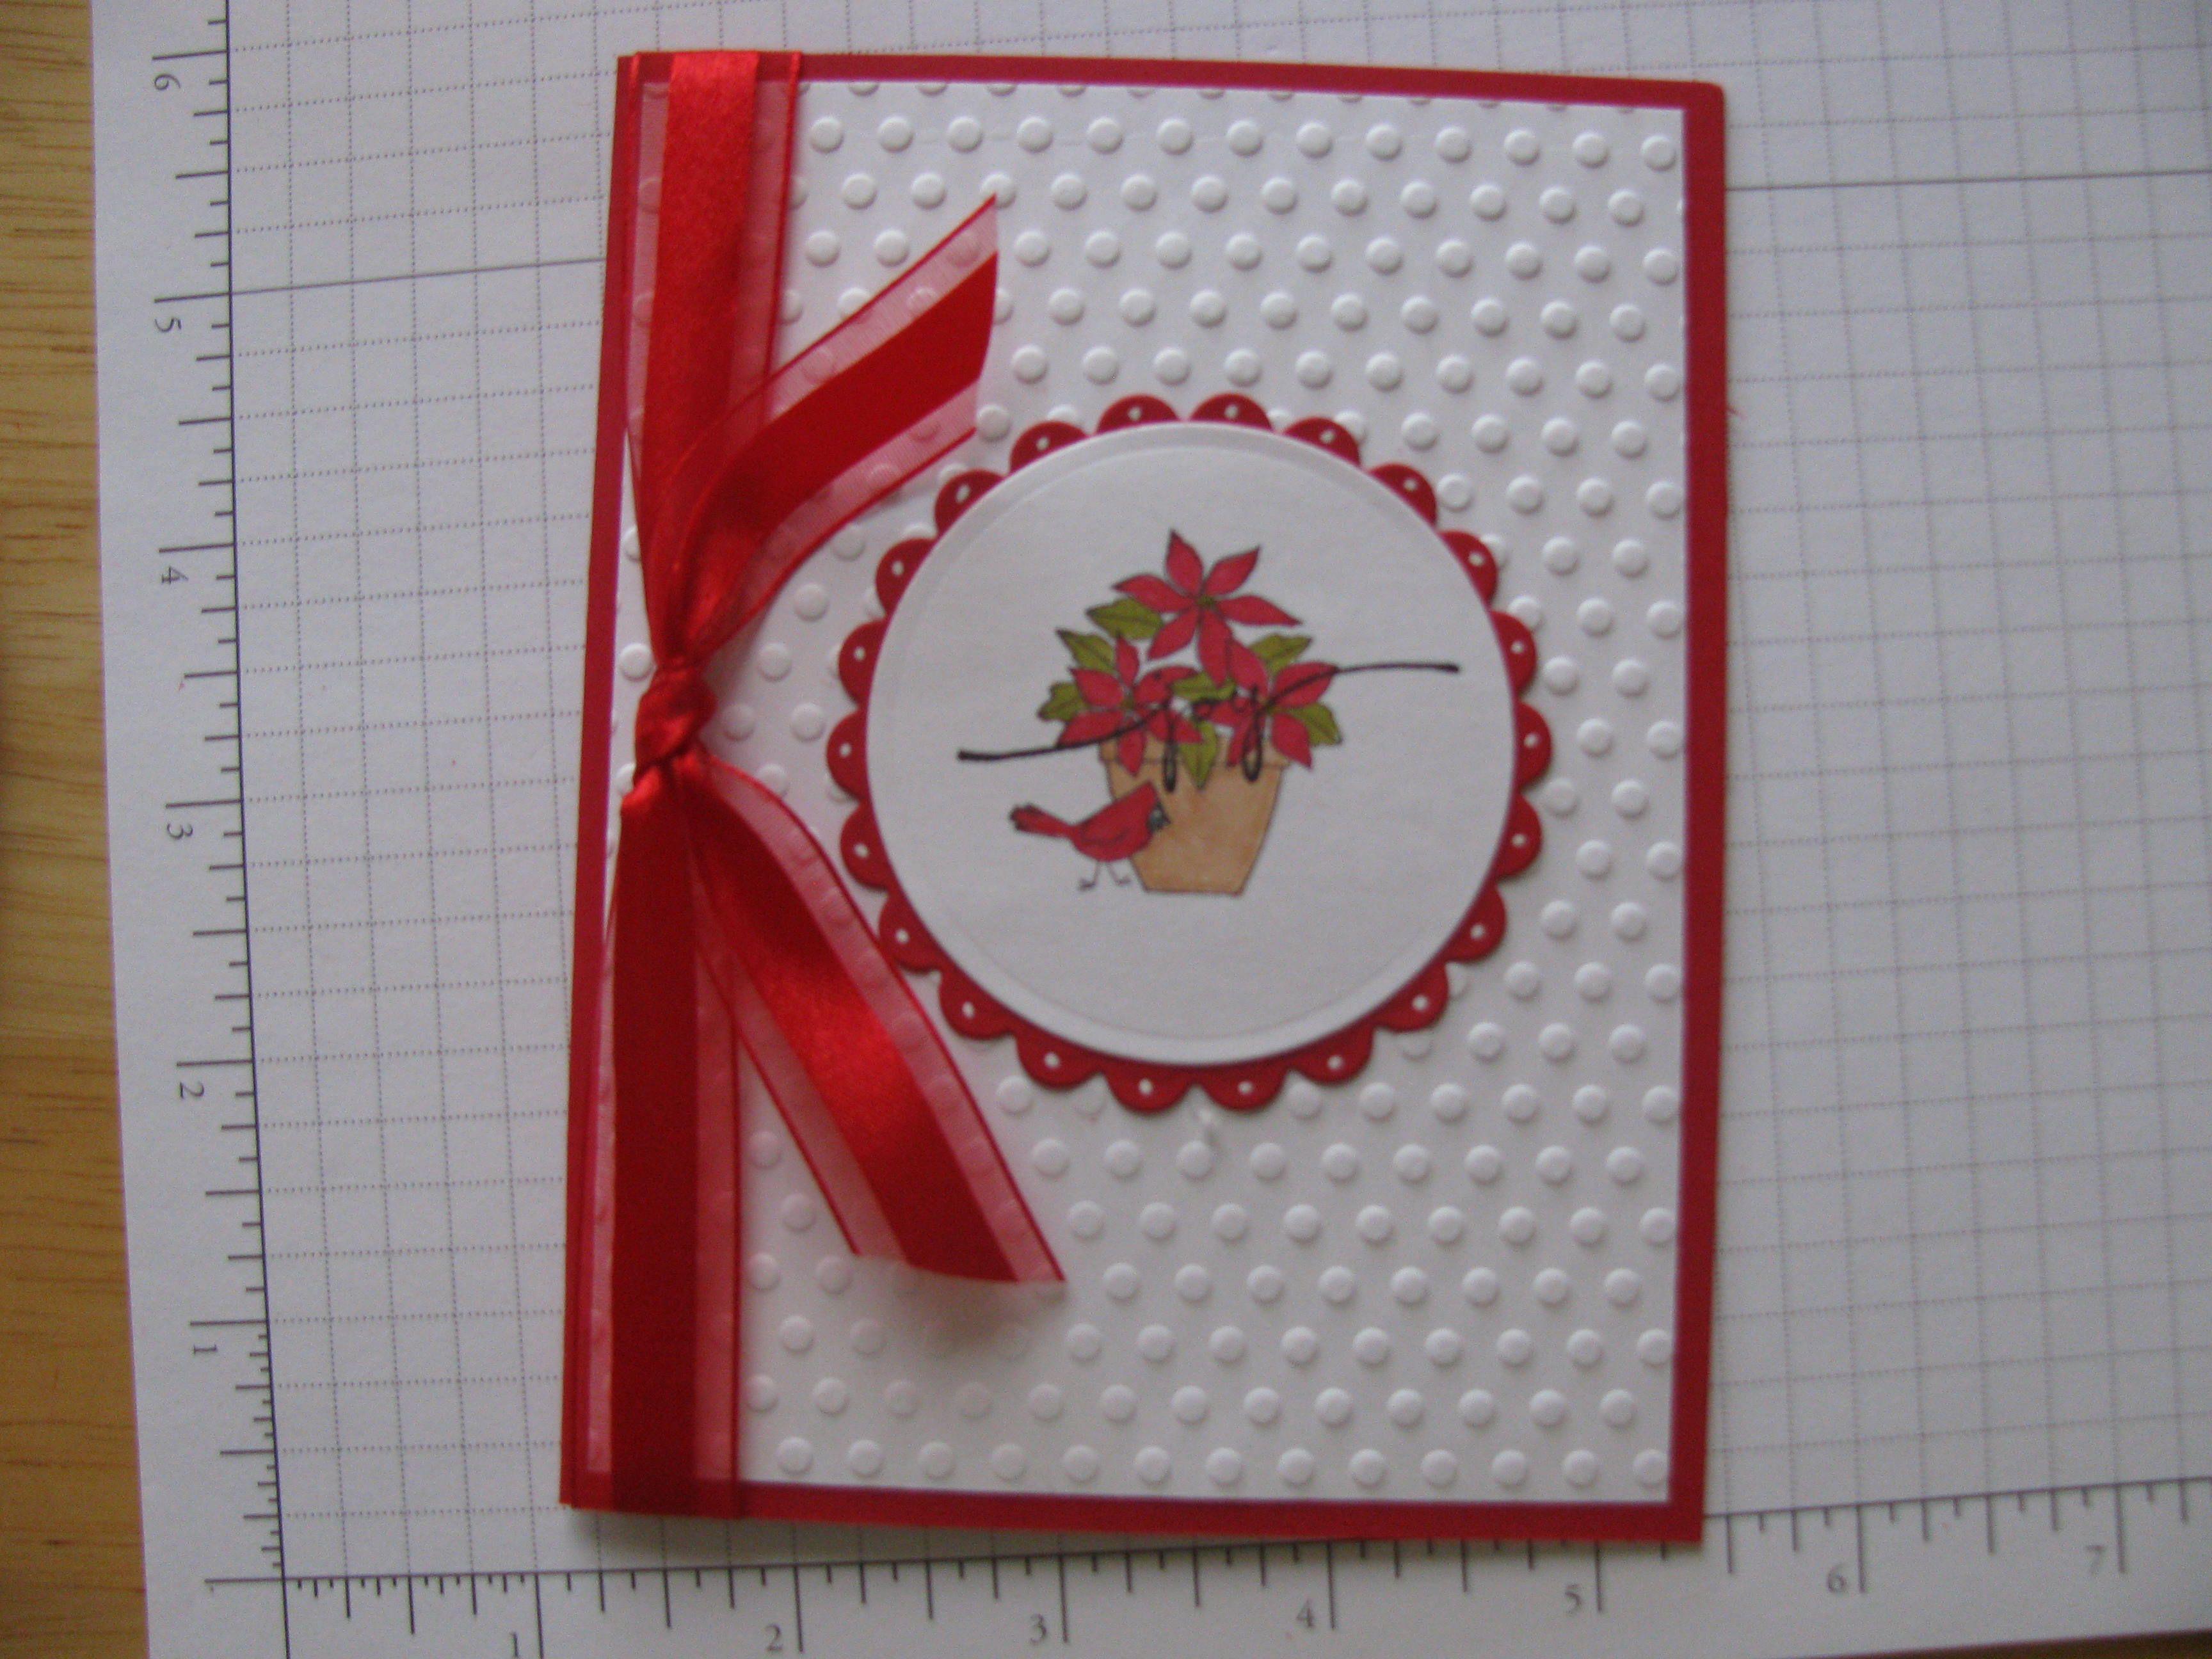 Christmas Card Making Ideas Free Part - 25: Handmade Christmas Cards | Handmade Christmas Card | Karens Handmade Cards